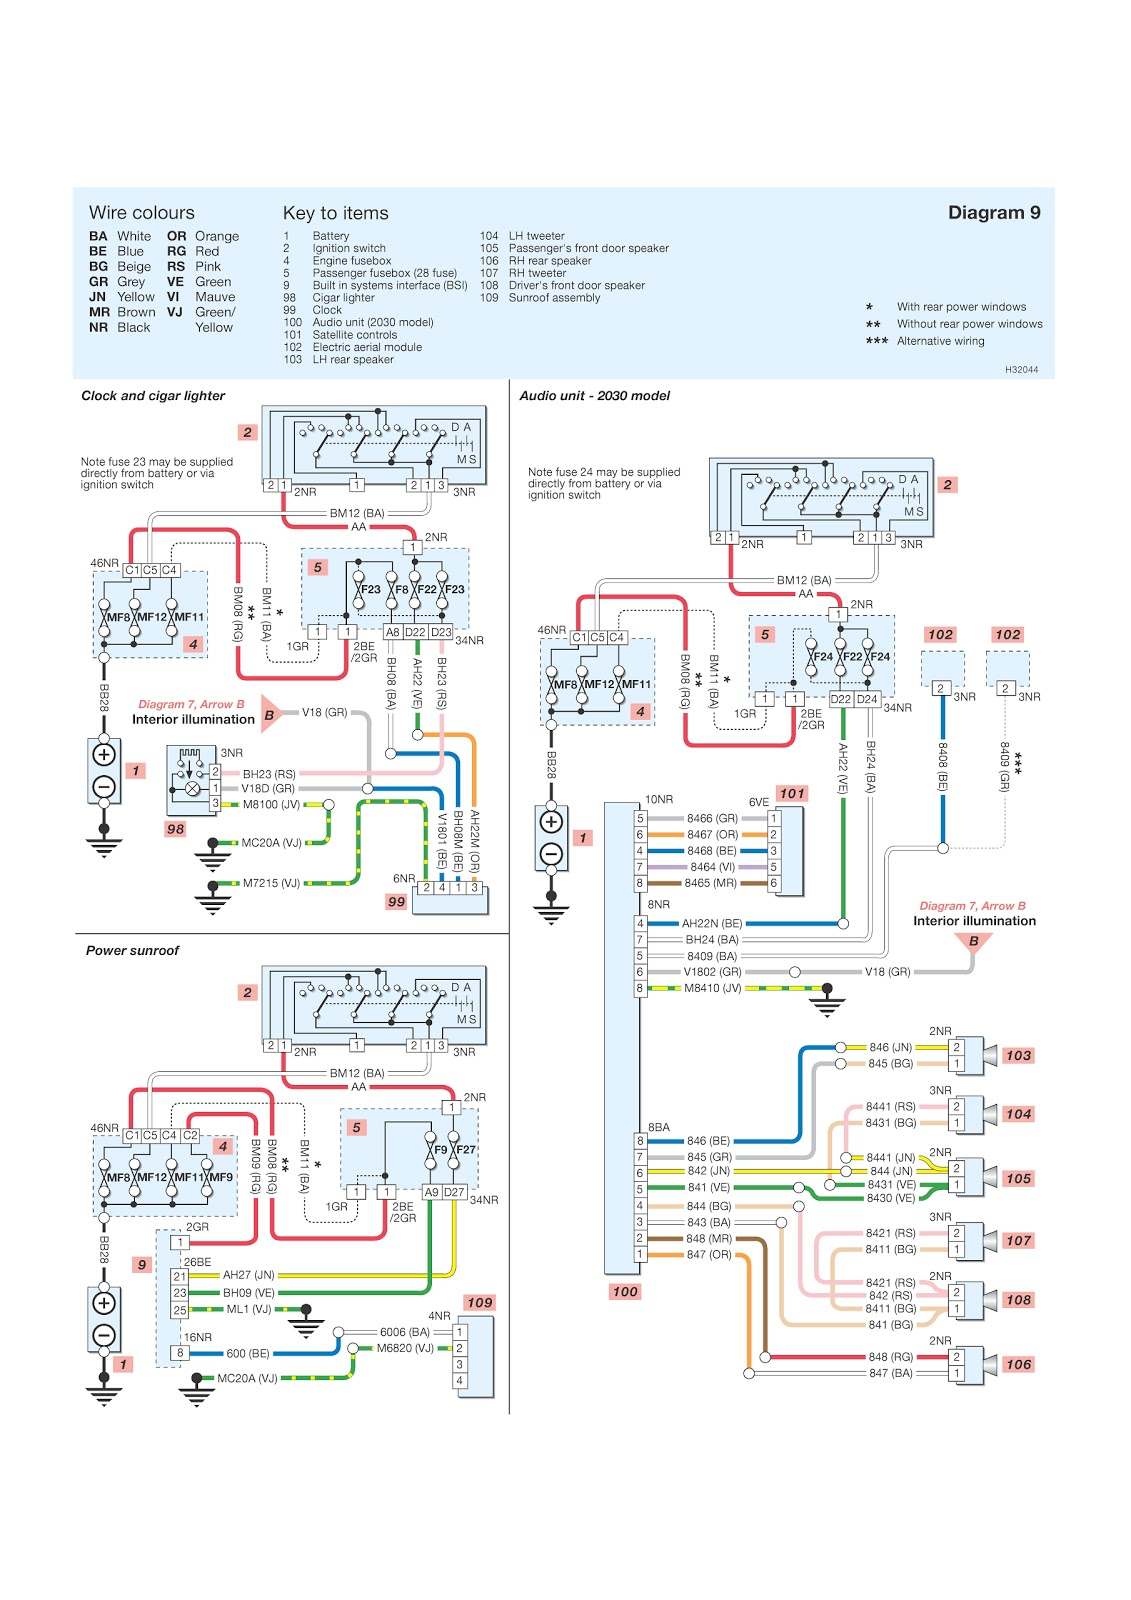 peugeot 206 wiring diagram 1986 honda trx 350 system diagrams clock cigar lighter